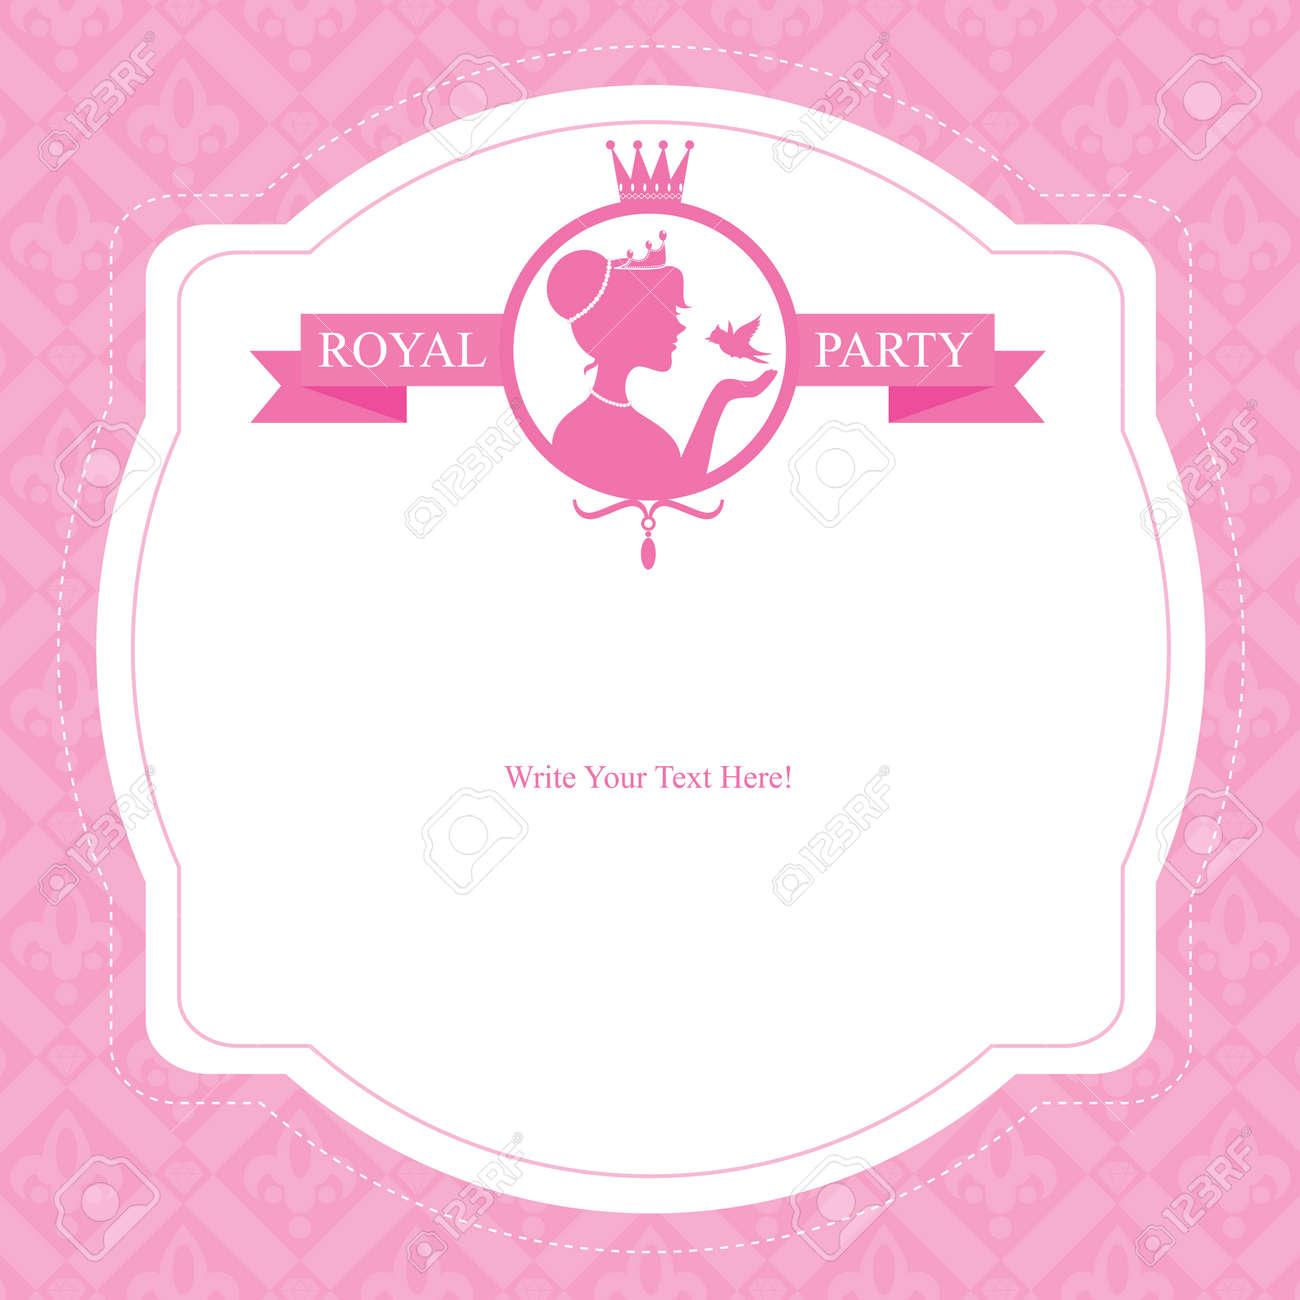 Birthday princess card invitation royalty free cliparts vectors birthday princess card invitation stock vector 29637862 stopboris Image collections